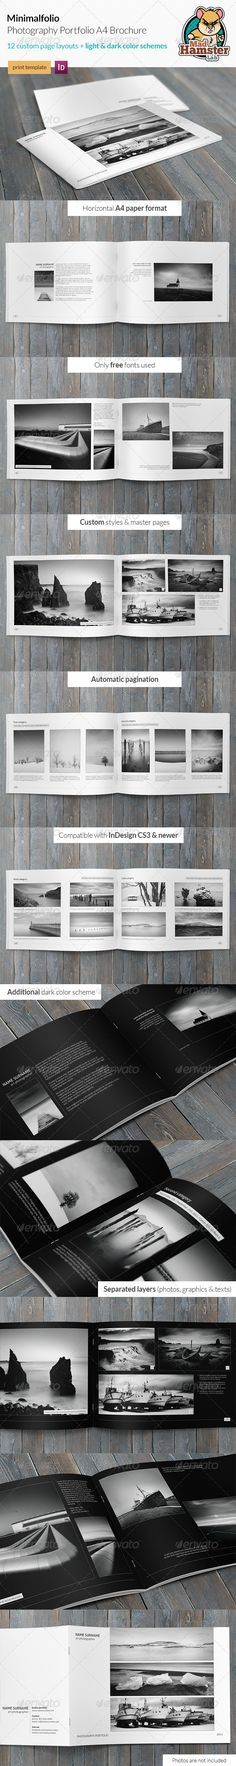 Minimalfolio Photography Portfolio A4 Brochure - Portfolio Brochures